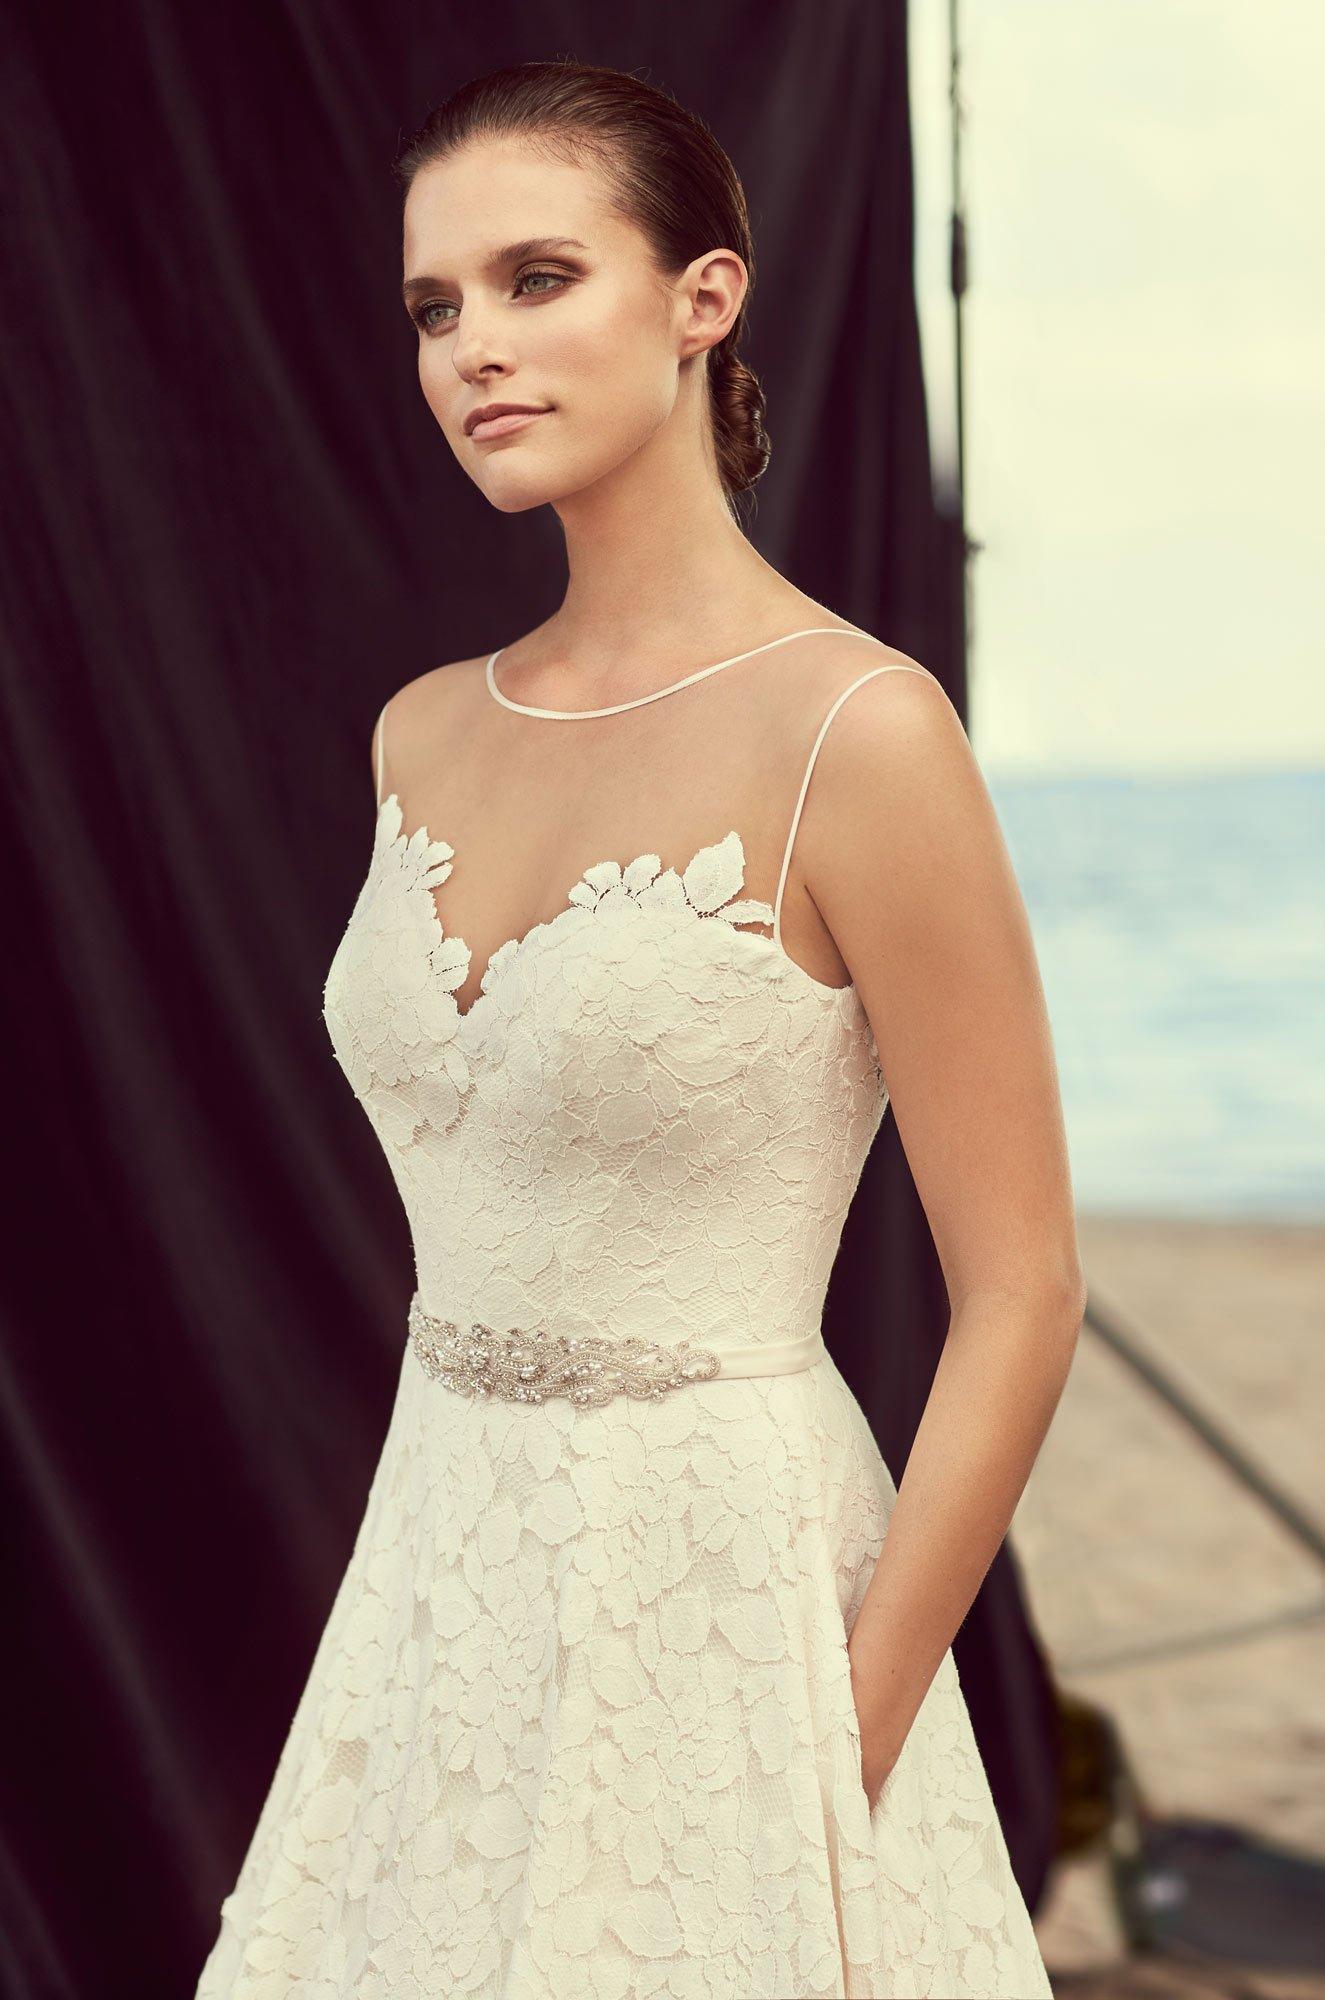 Full Lace Skirt Wedding Dress – Style #2188 | Mikaella Bridal